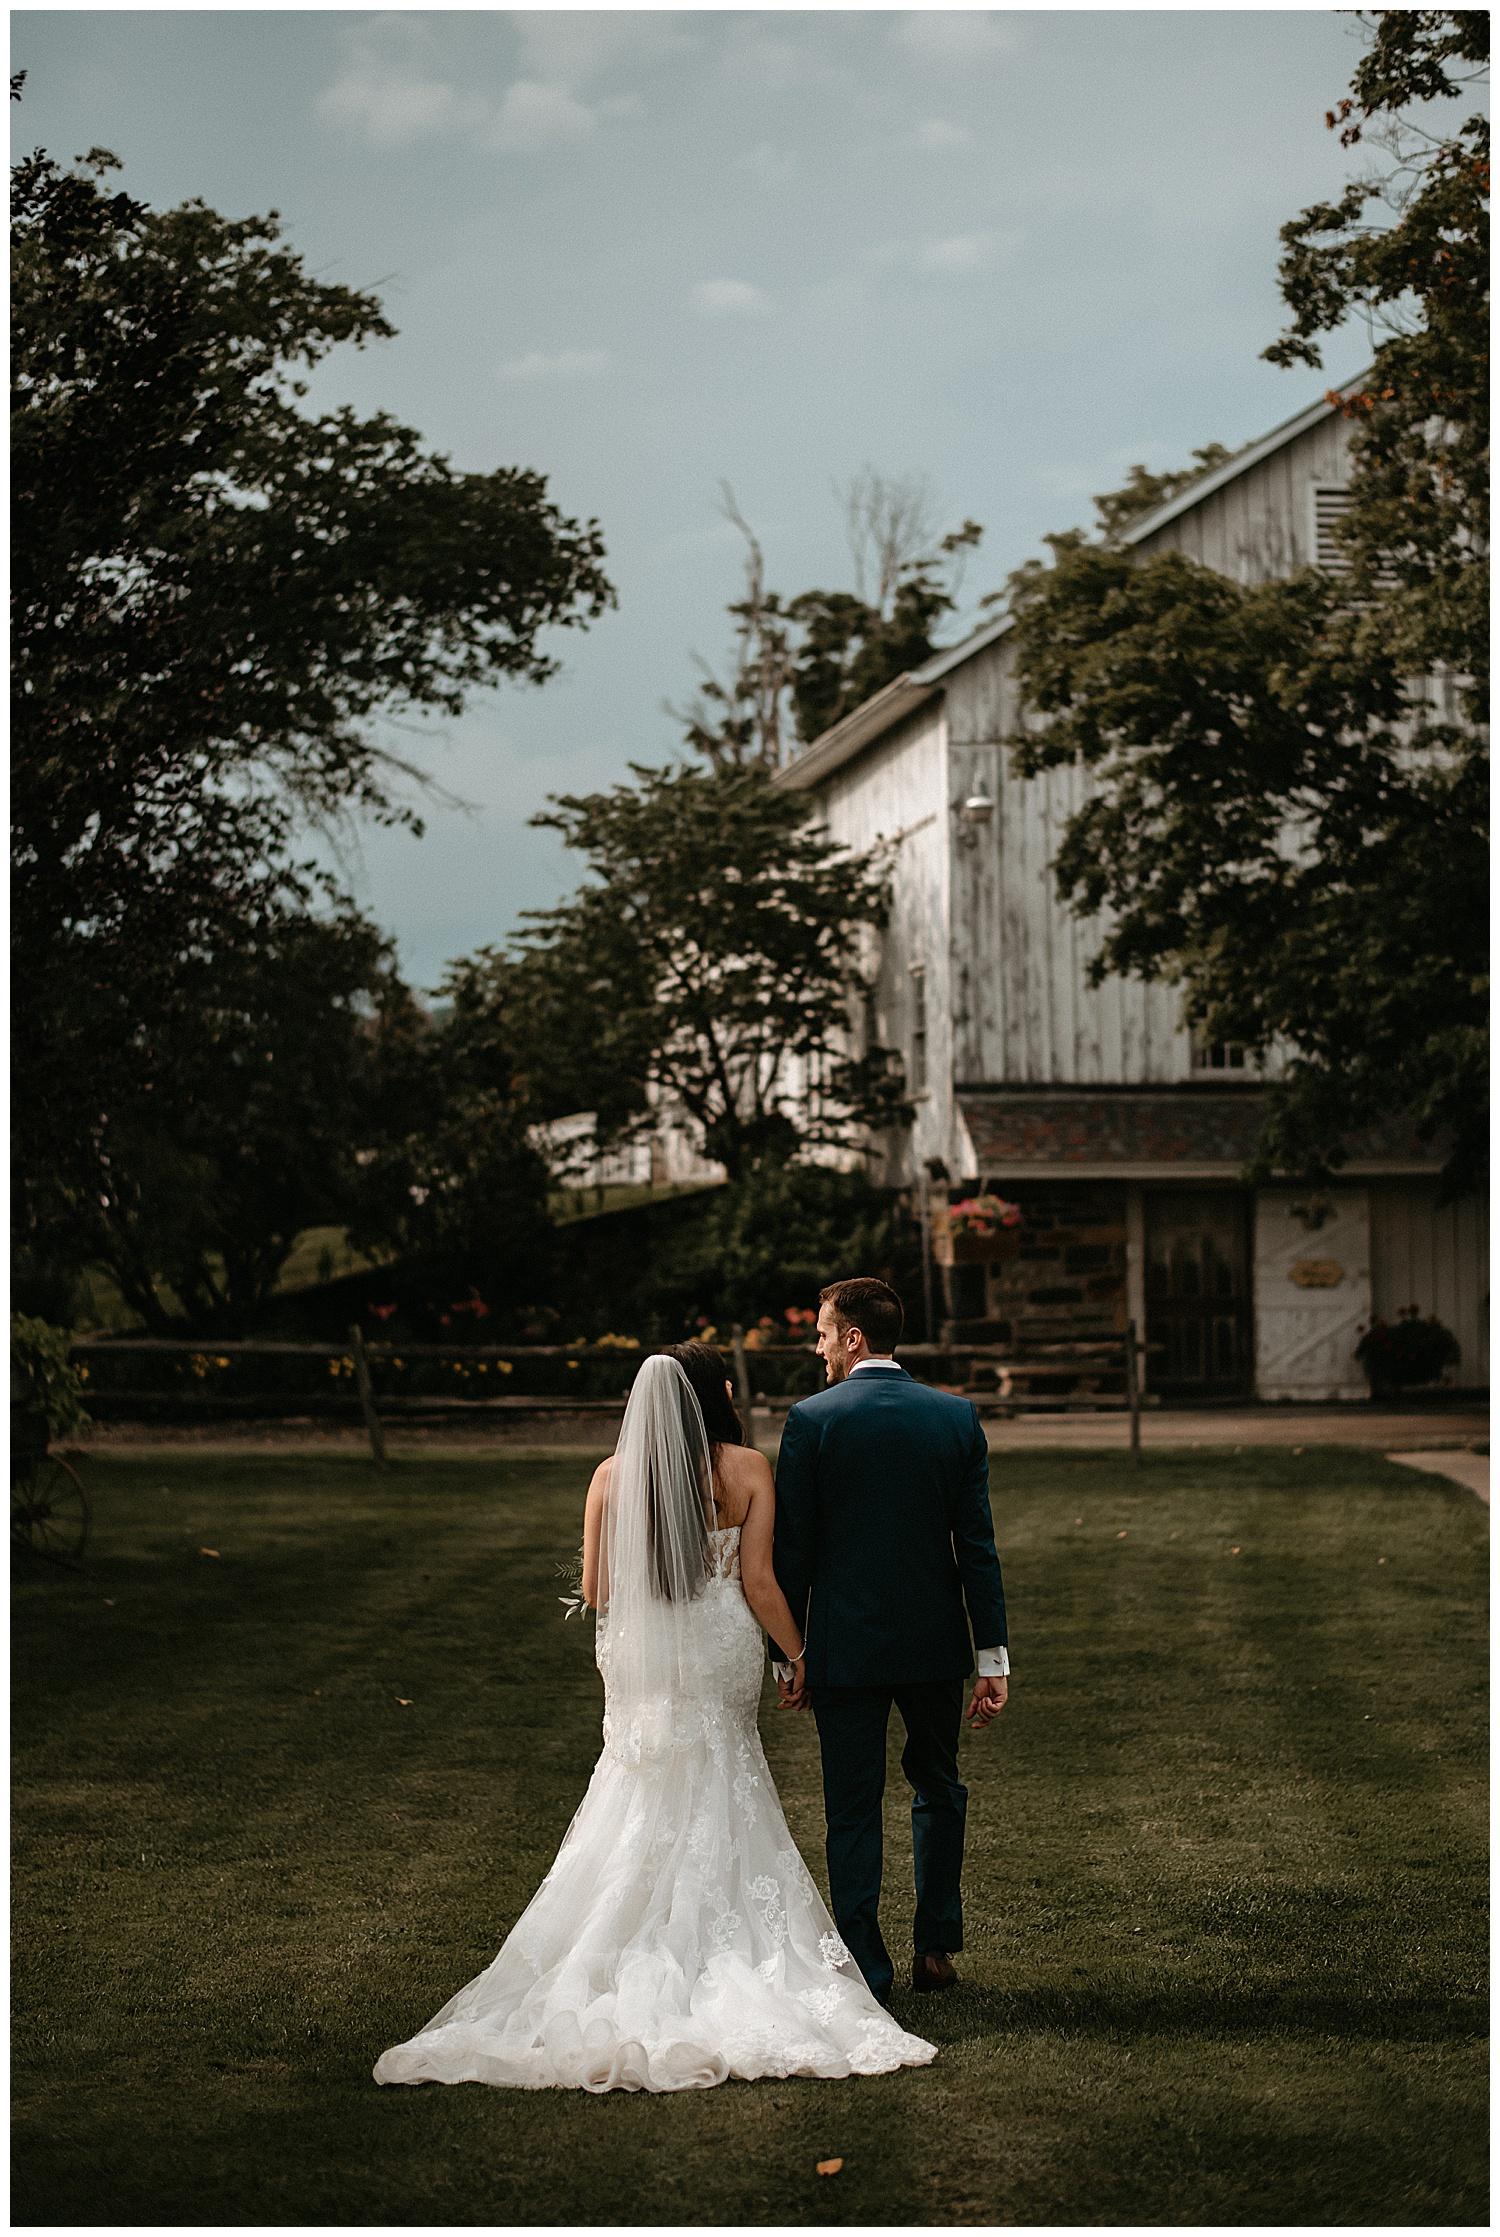 NEPA-Bloomsburg-Wedding-Photographer-at-The-Barn-at-Boones-Dam-Bloomsburg-PA_0075.jpg